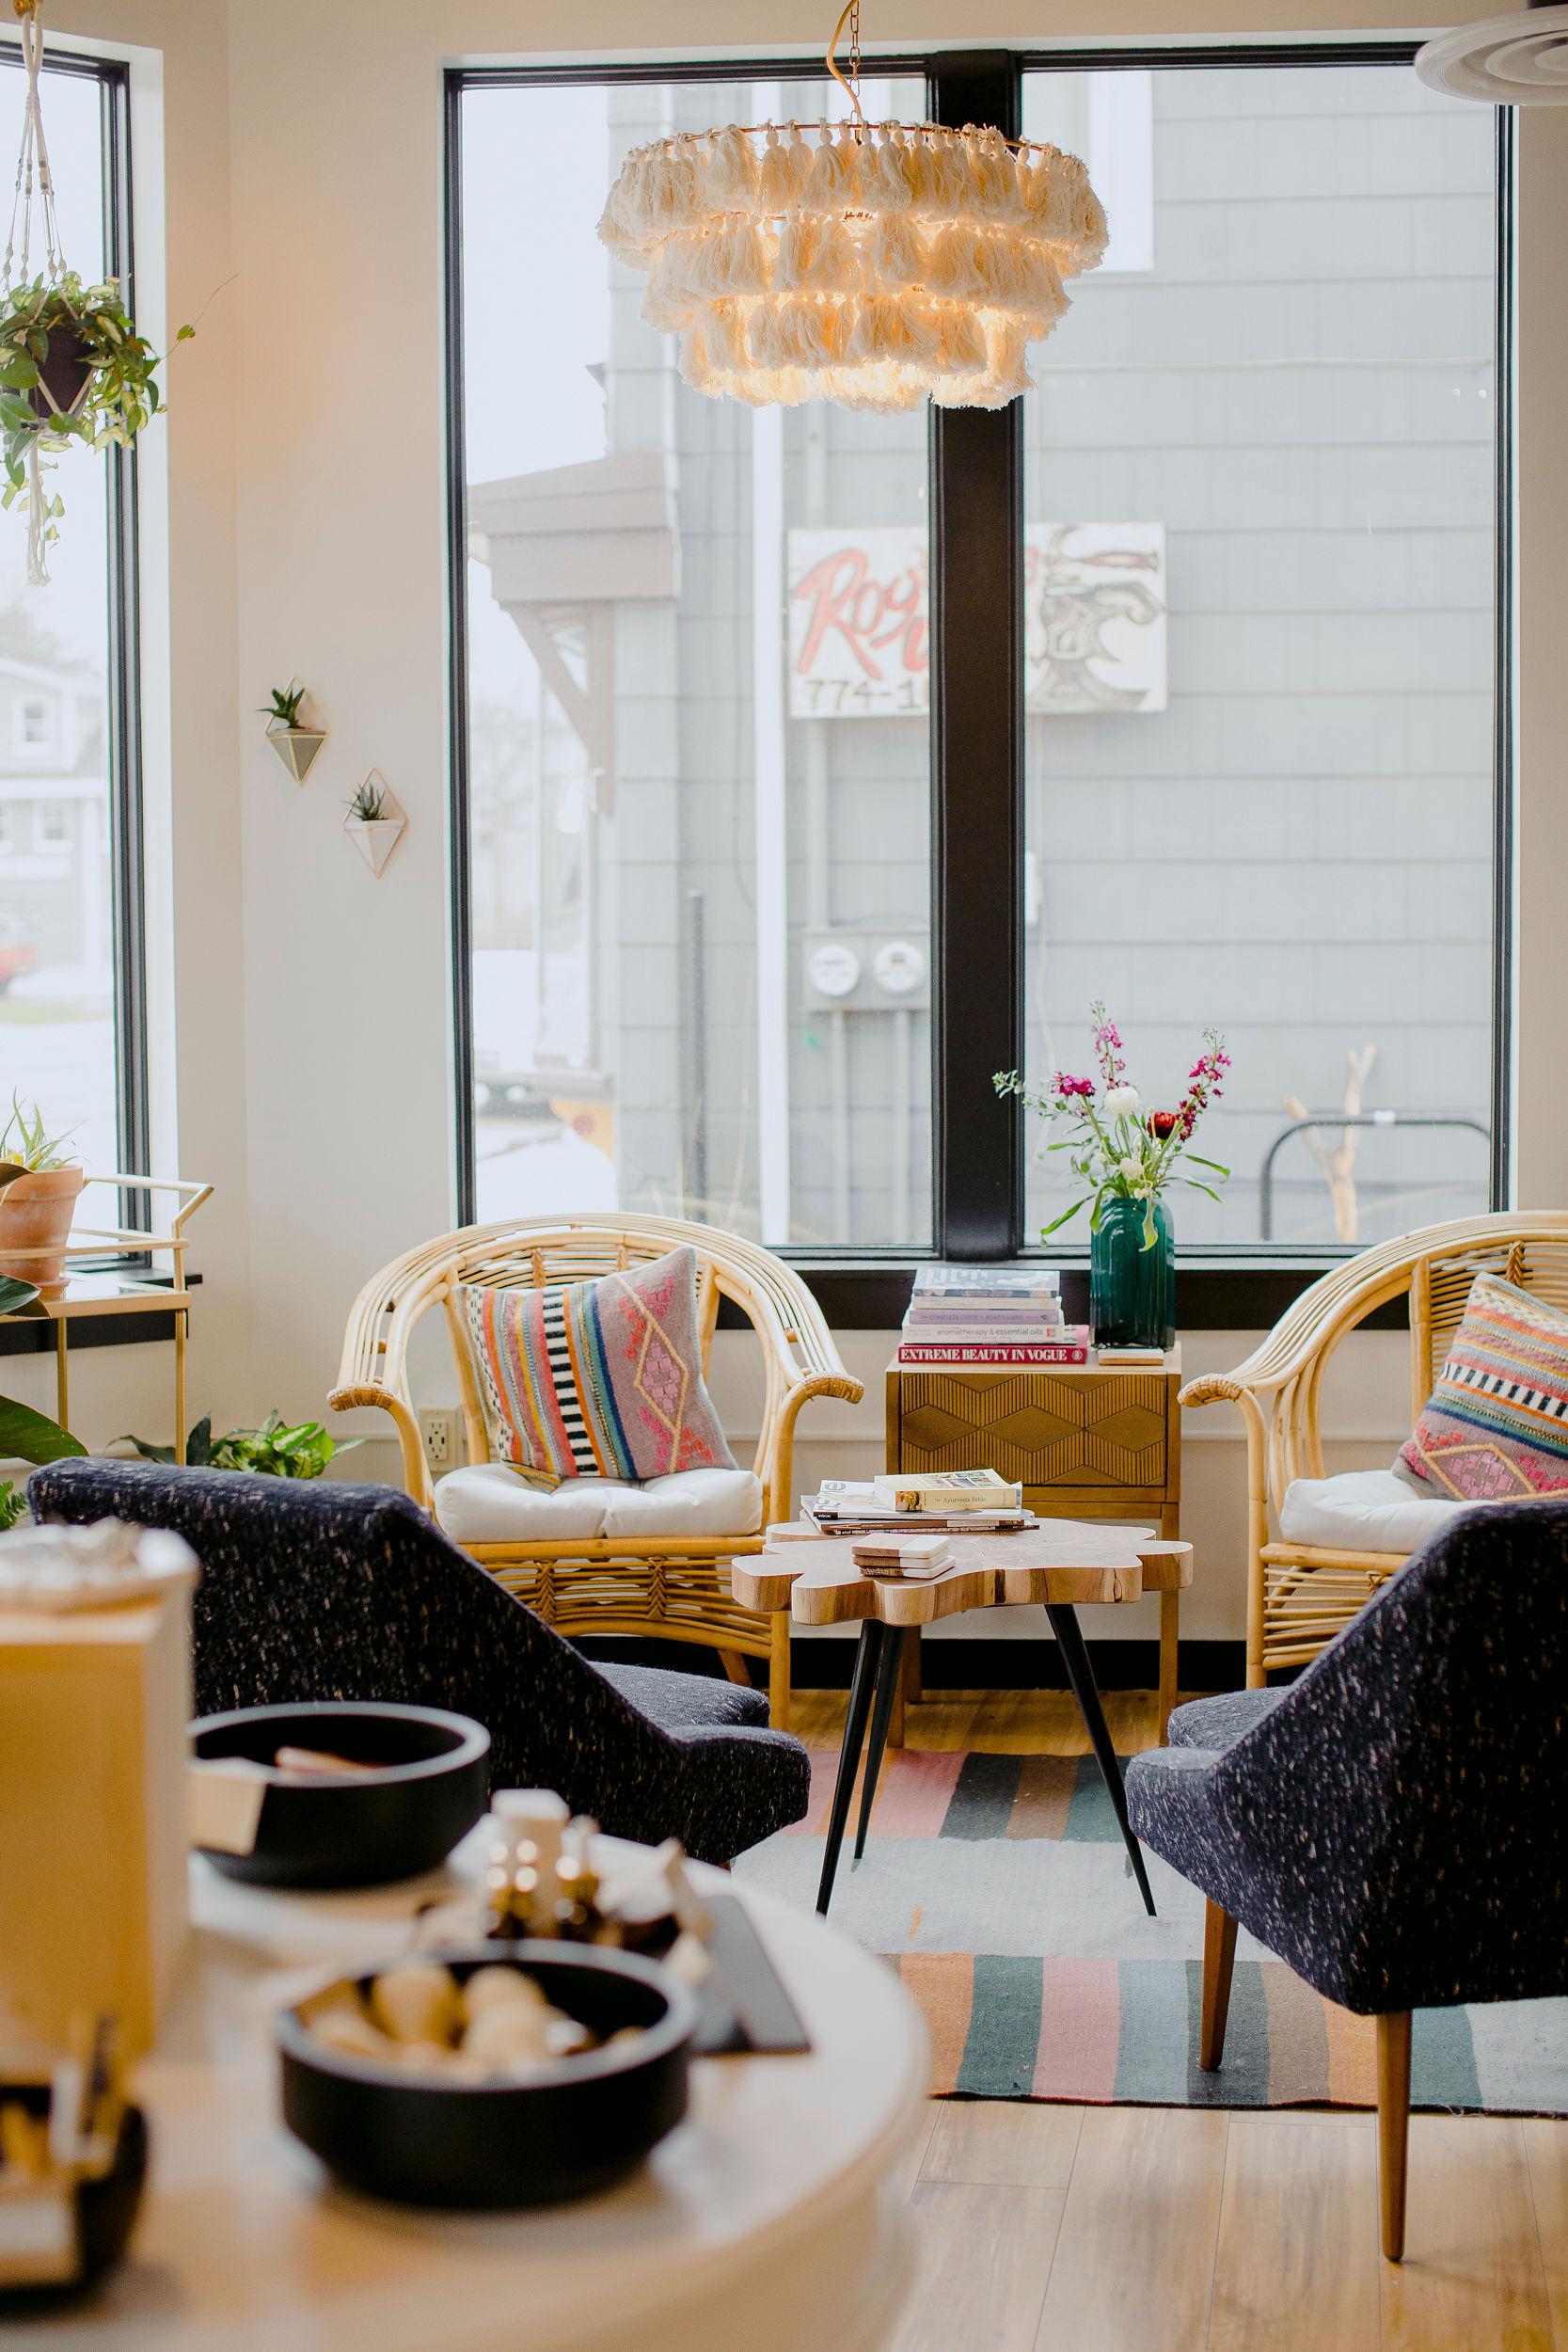 The Lounge at ABURA: modern apothecary + skin care studio. Photo by Meredith Brockington.